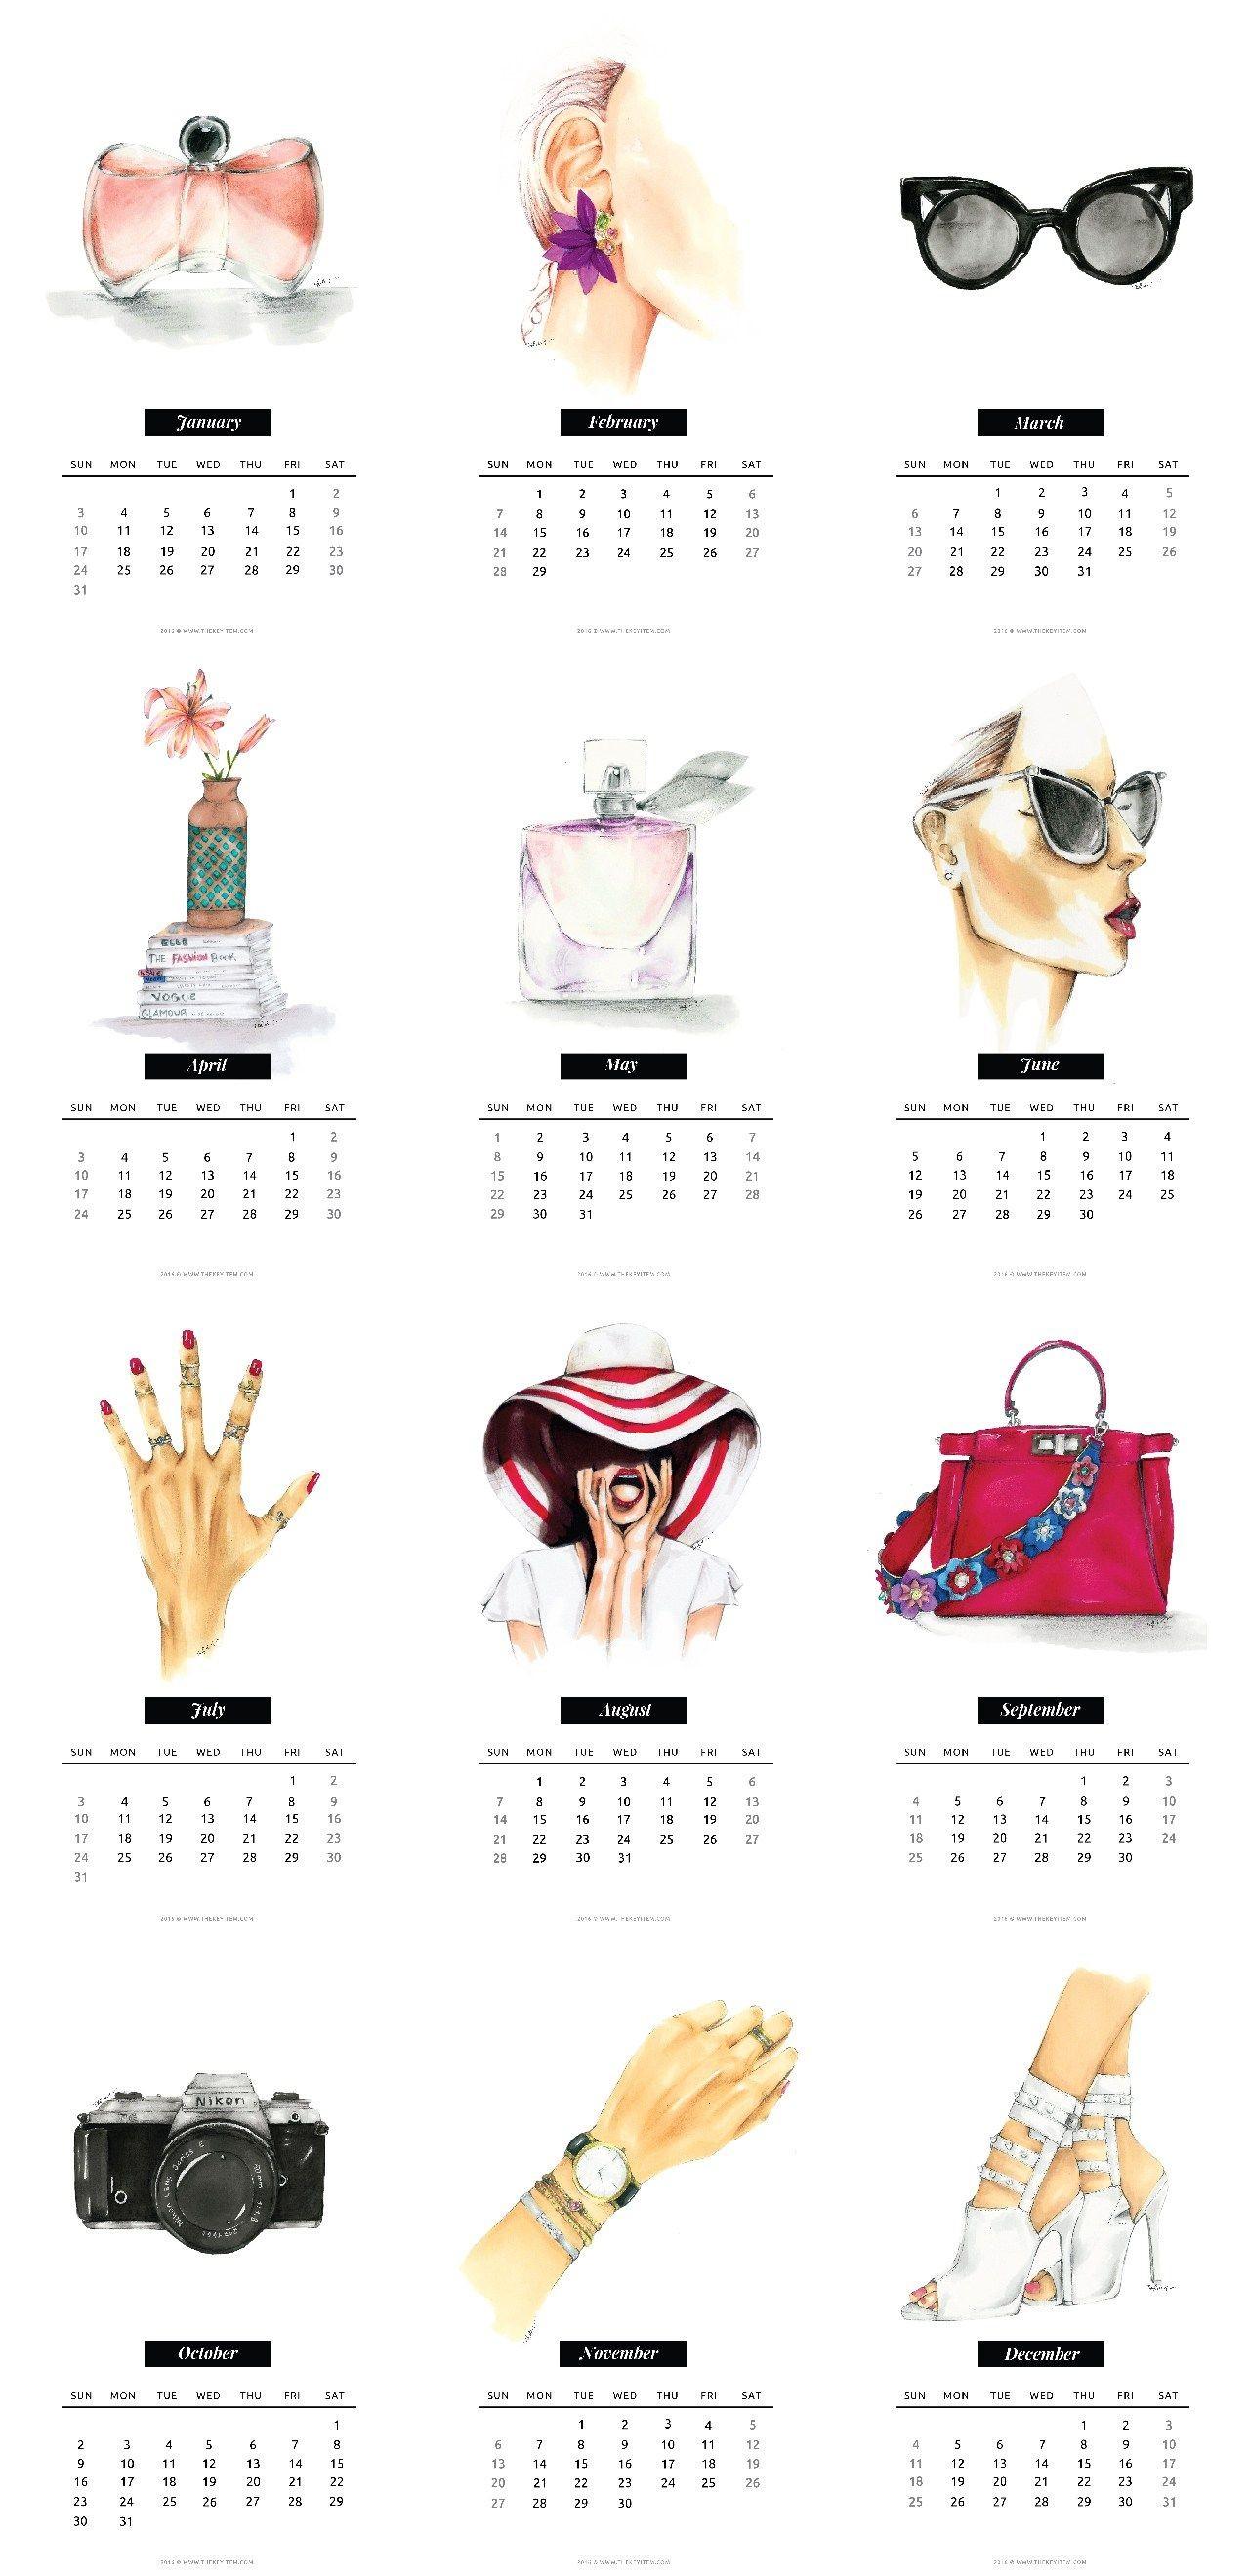 Imprimir Calendario 2019 Semanas Actual Calendario Ilustrado 2016 Gratis Ilustraciones Of Imprimir Calendario 2019 Semanas Recientes Noticias Calendario 2019 Mexico Icial